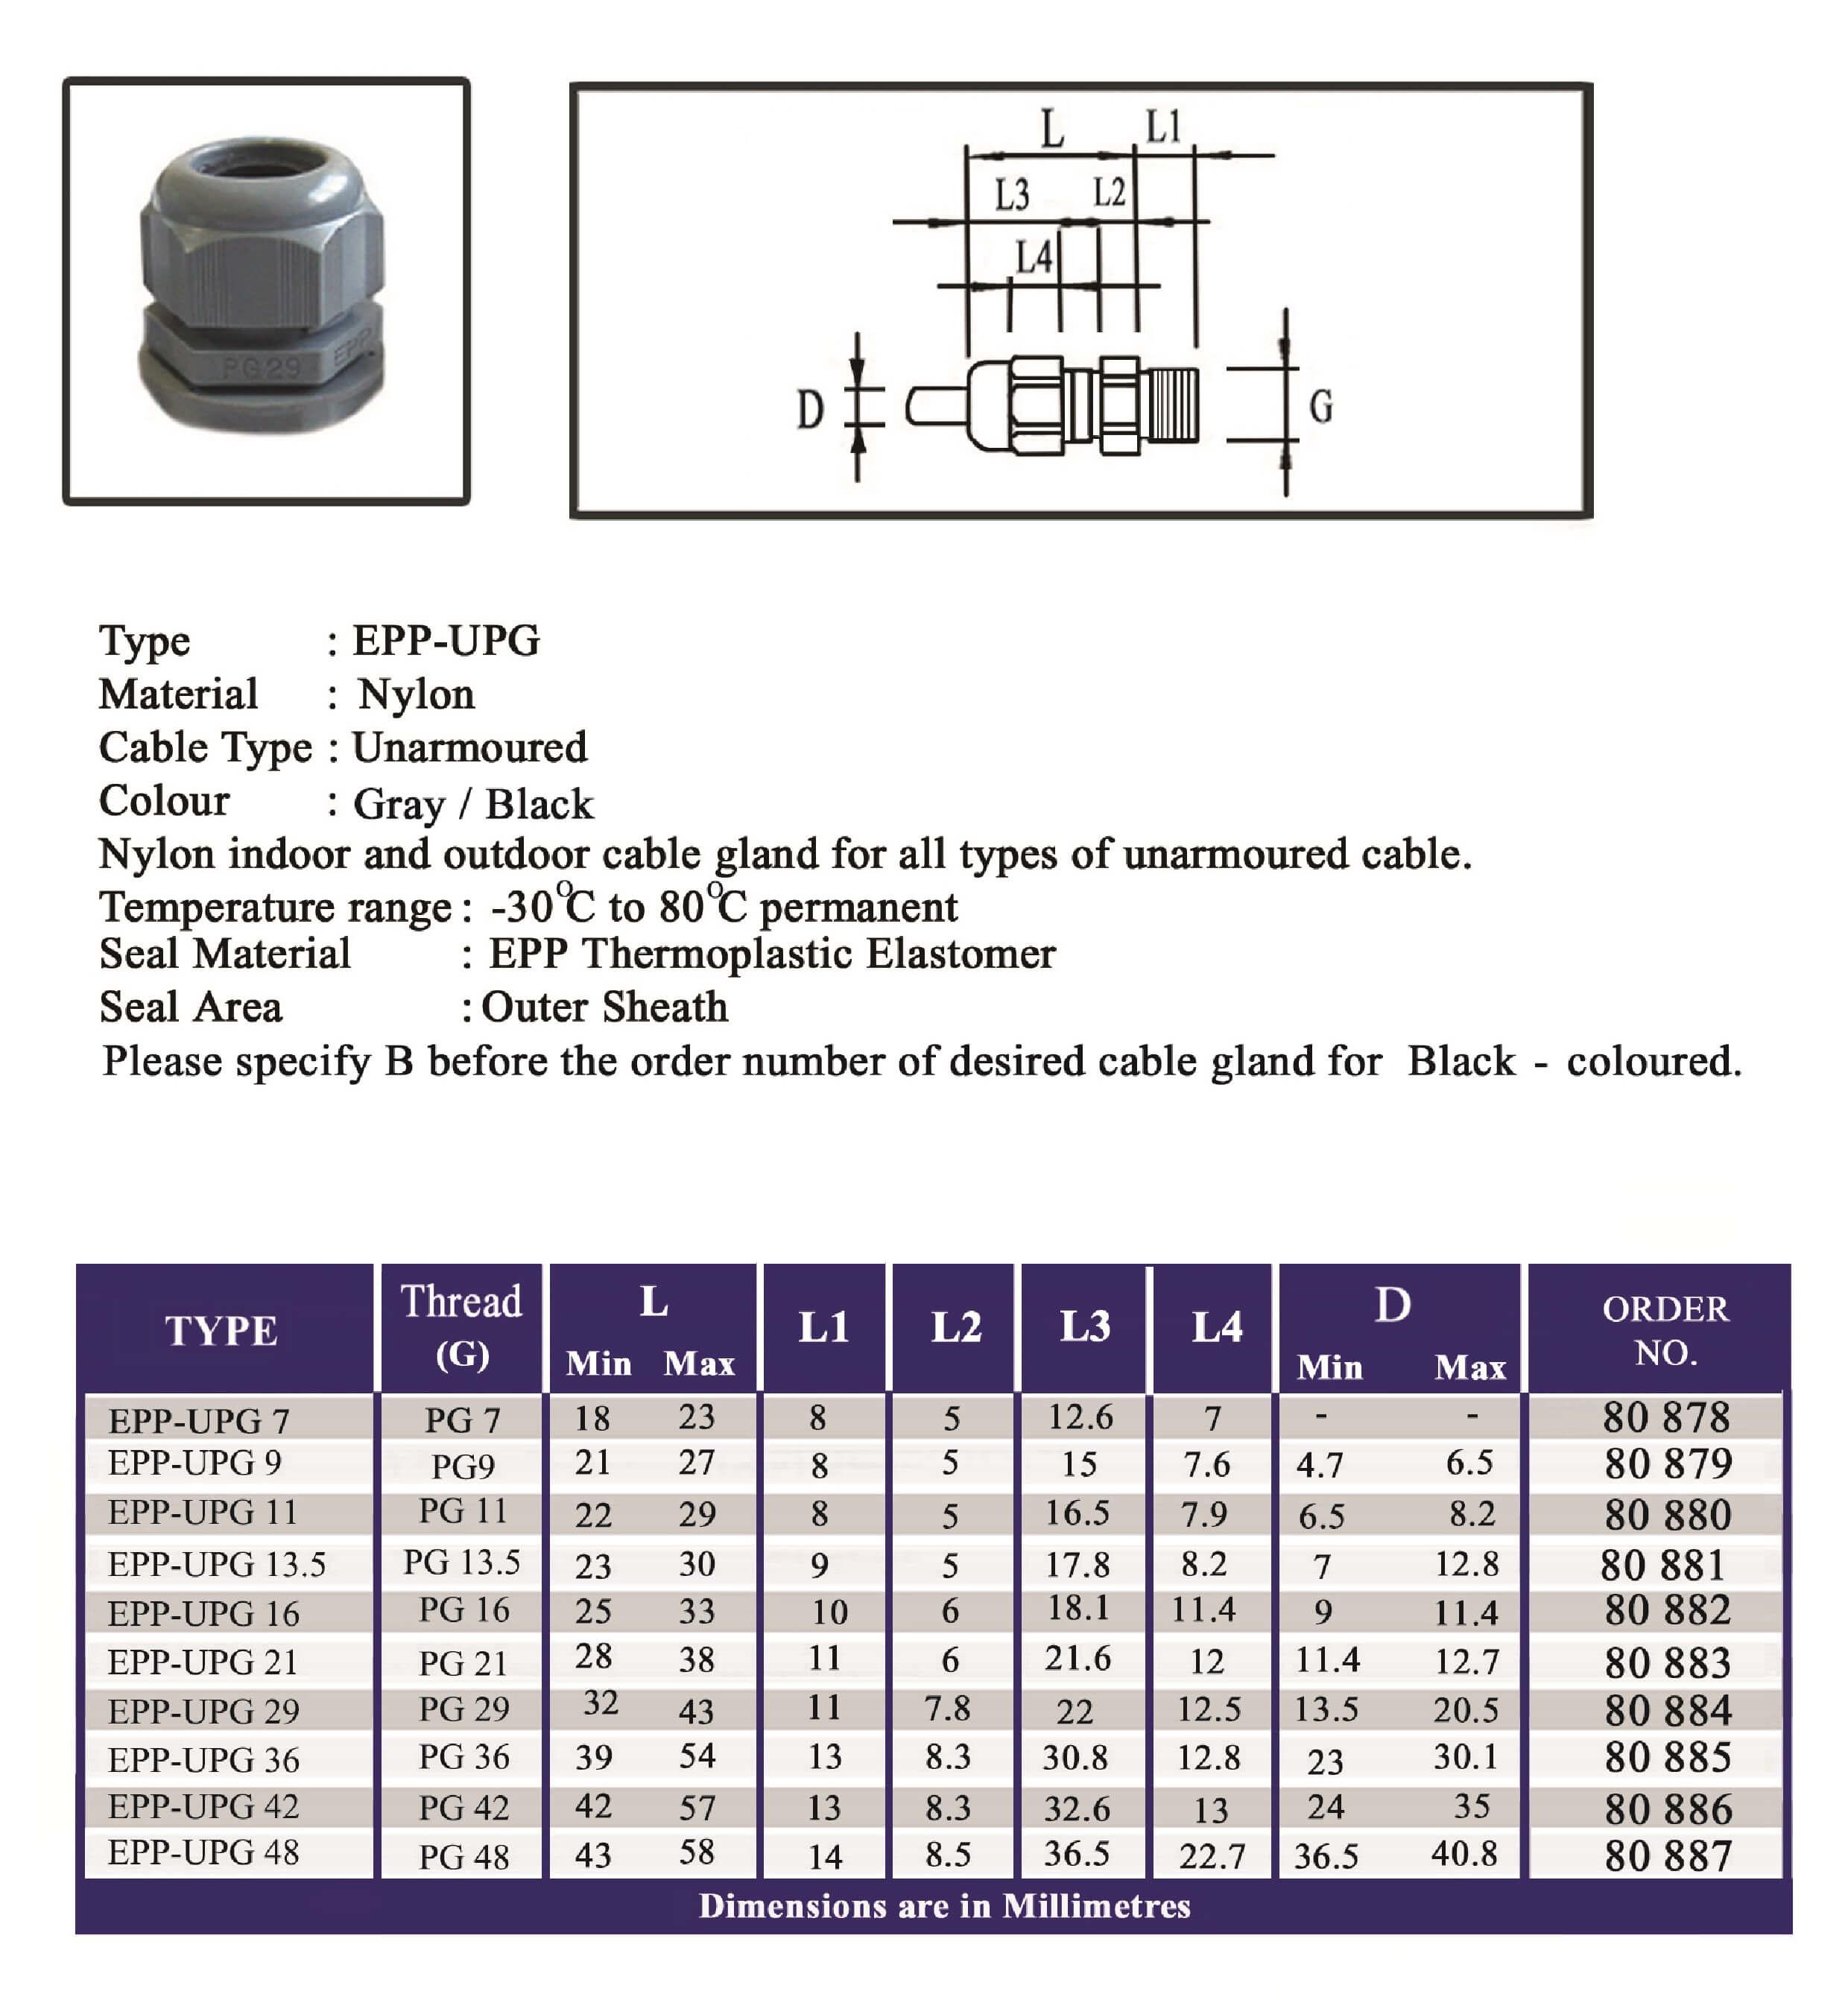 E.P.P - UPG Technical Datasheet